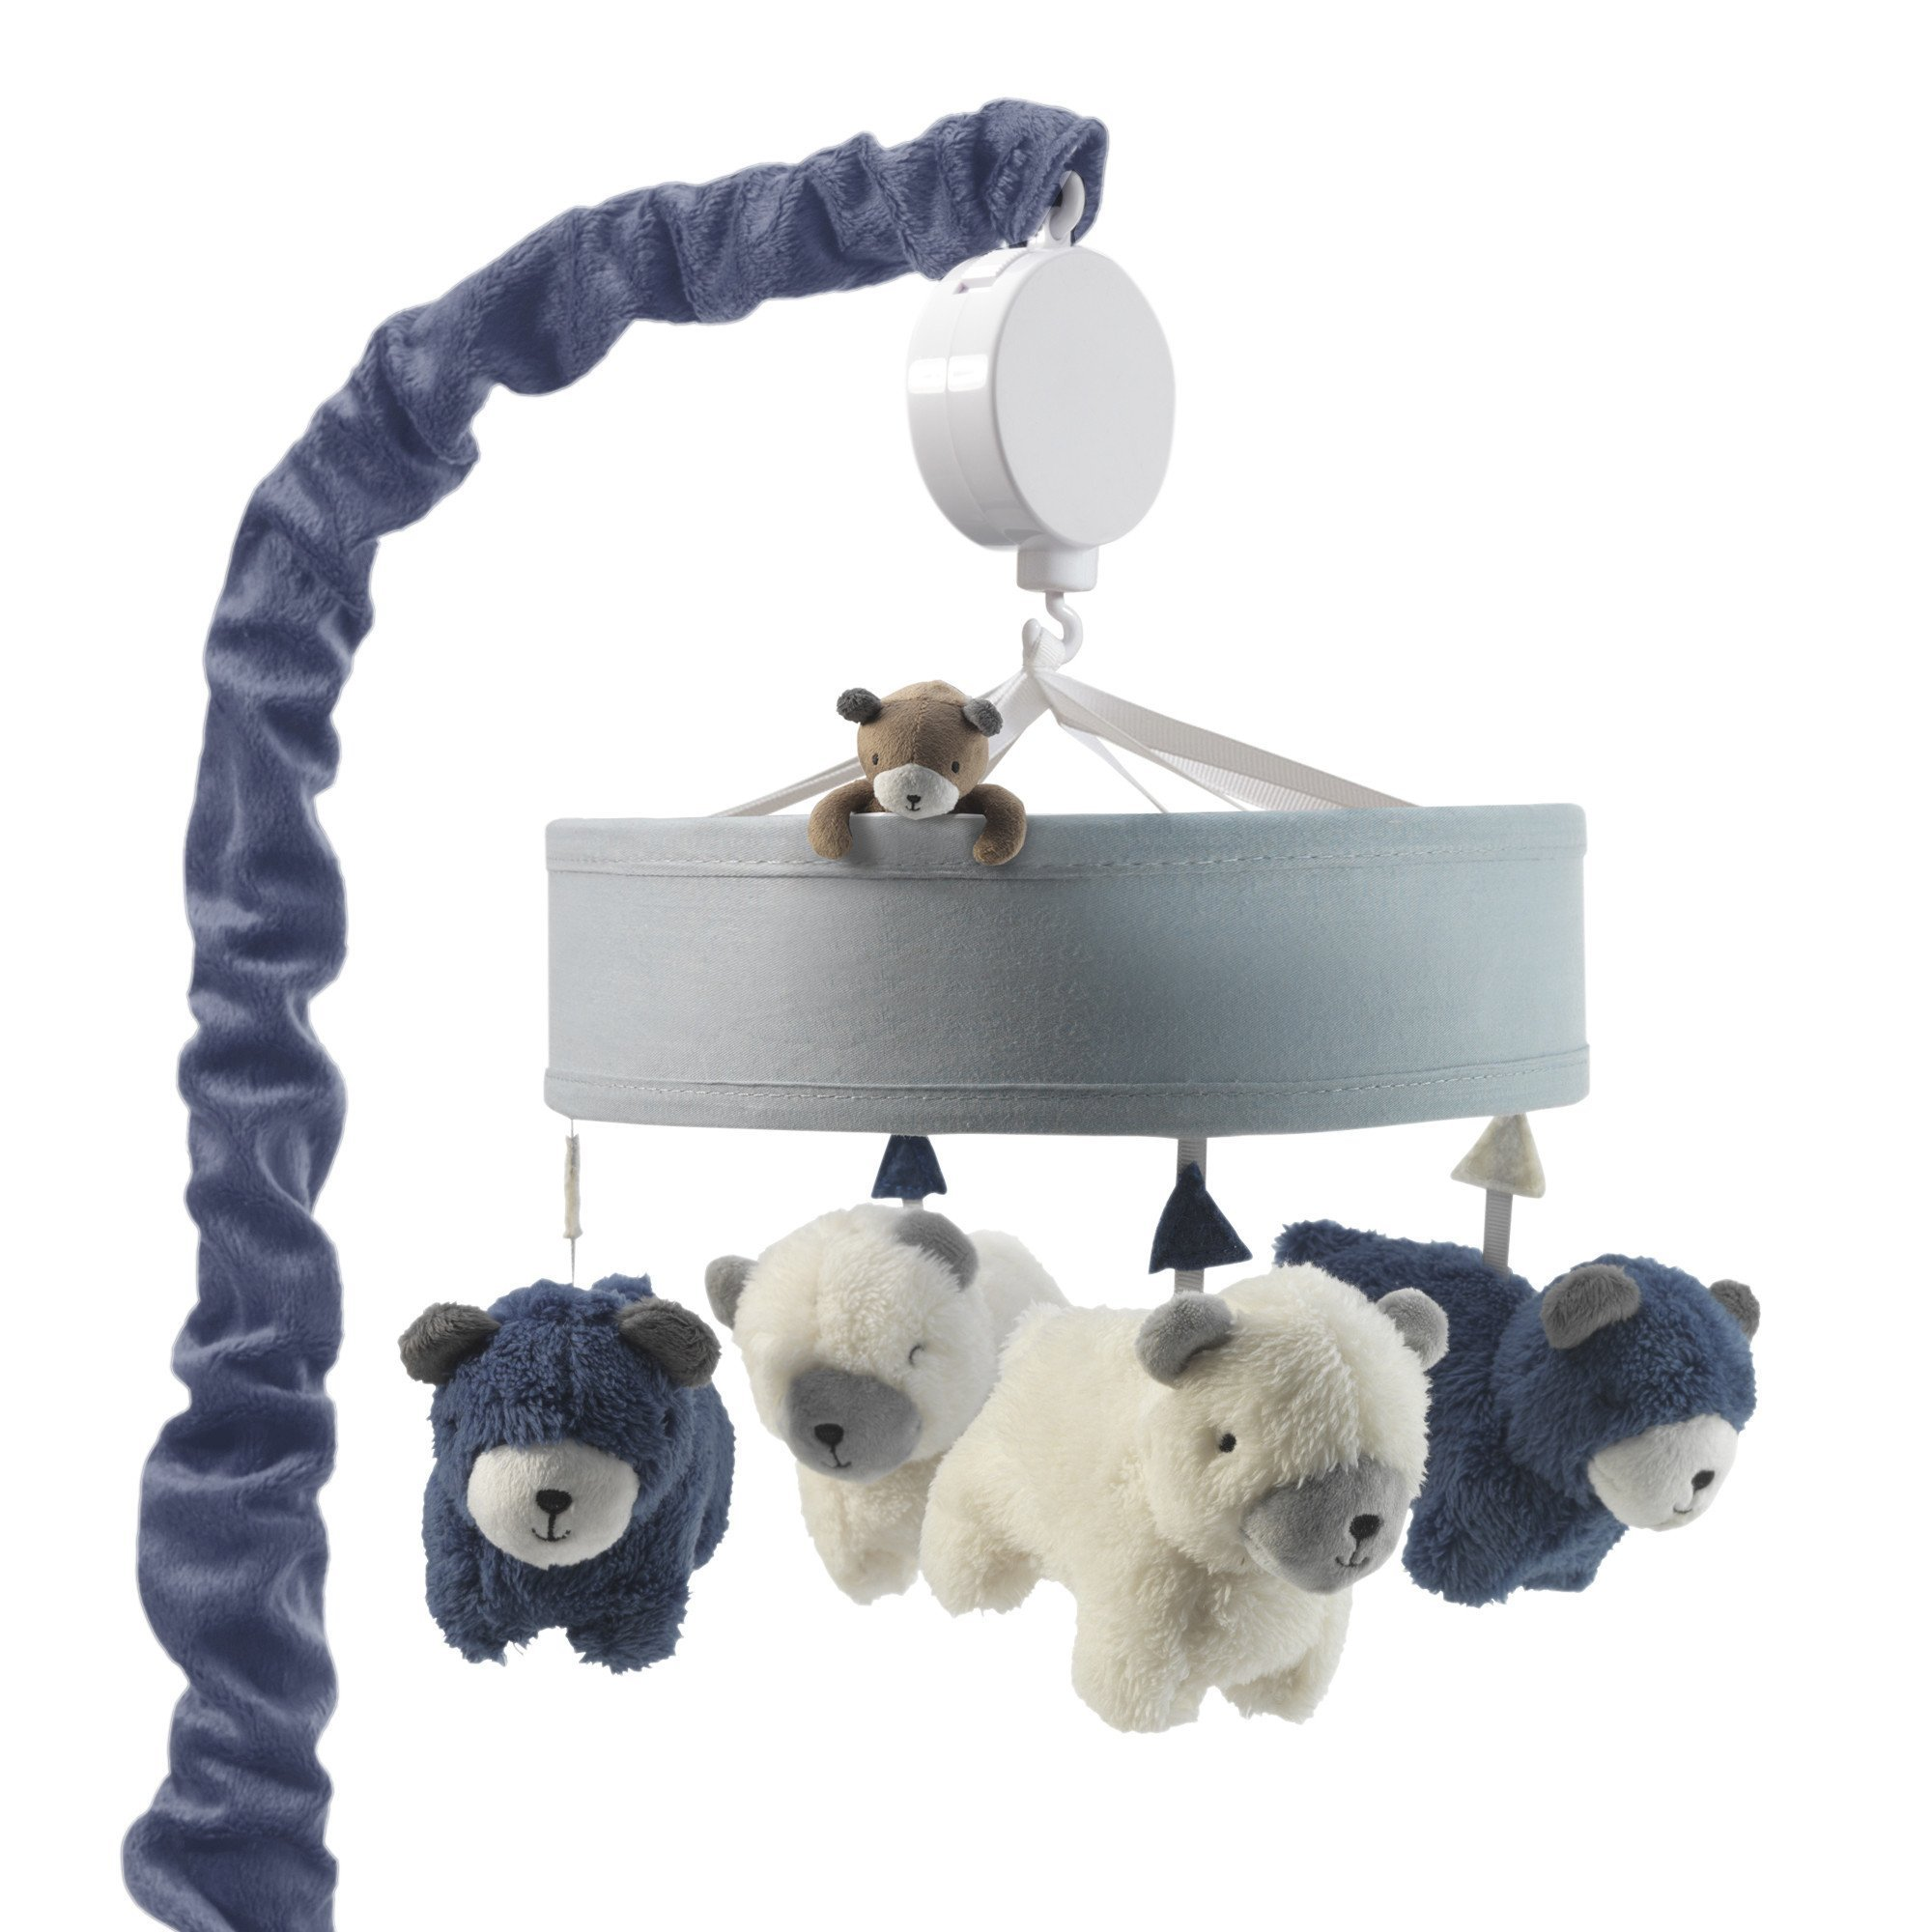 Lambs & Ivy Signature Montana Musical Mobile - Blue/White Bears